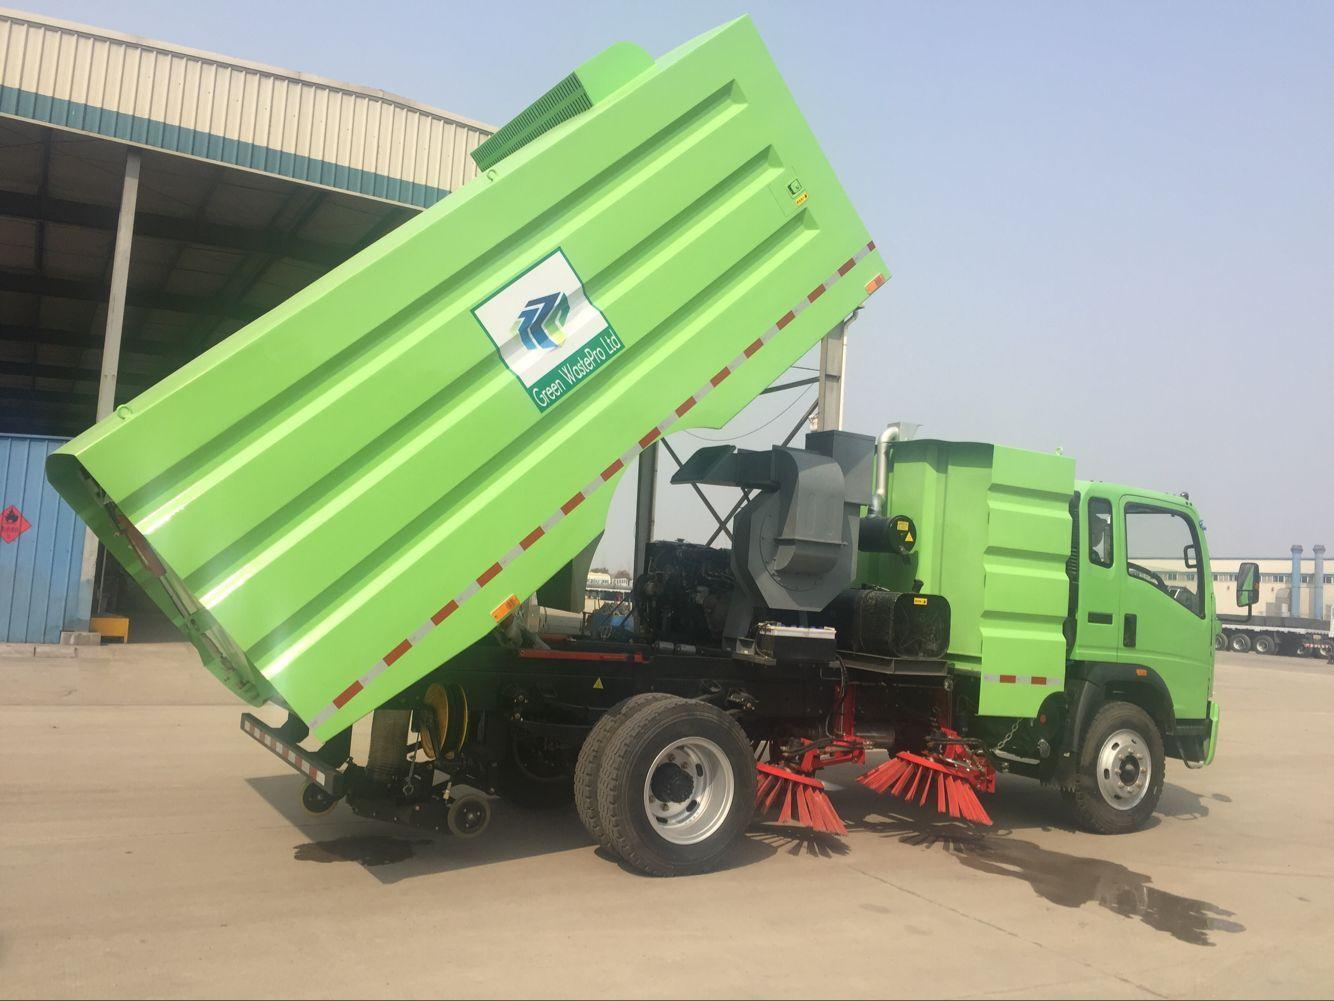 SINOTRUK HOWO 4x2 Road Sweeper Truck - Buy road sweeper